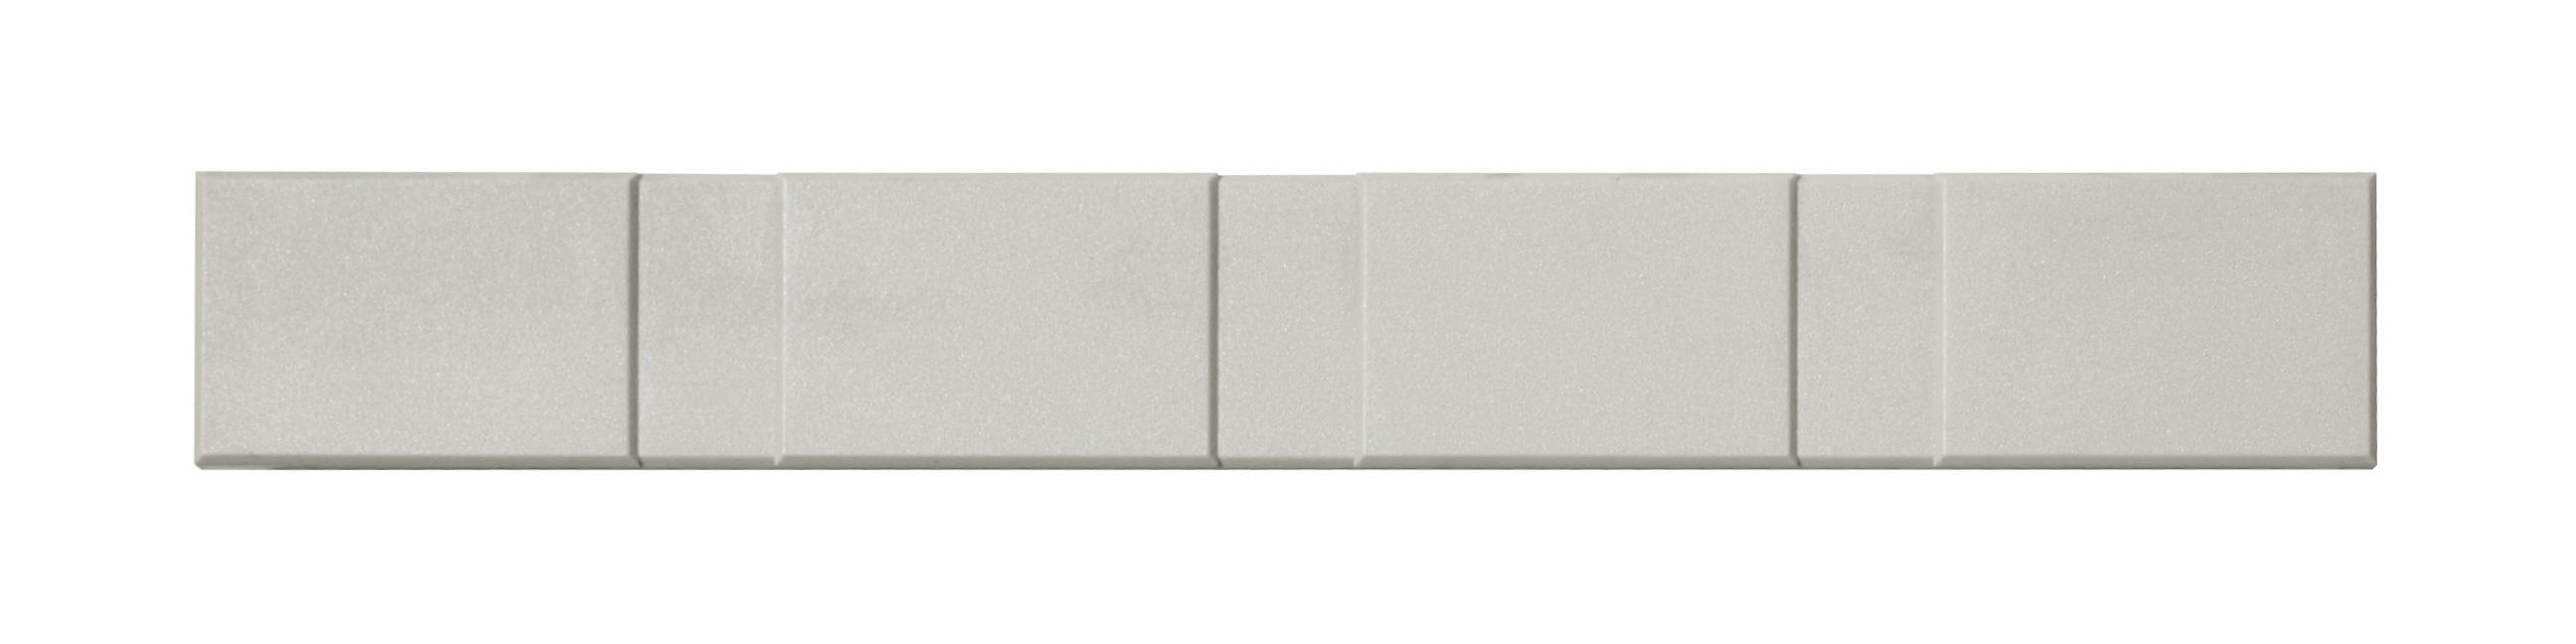 SI014850 - Schrack Technik